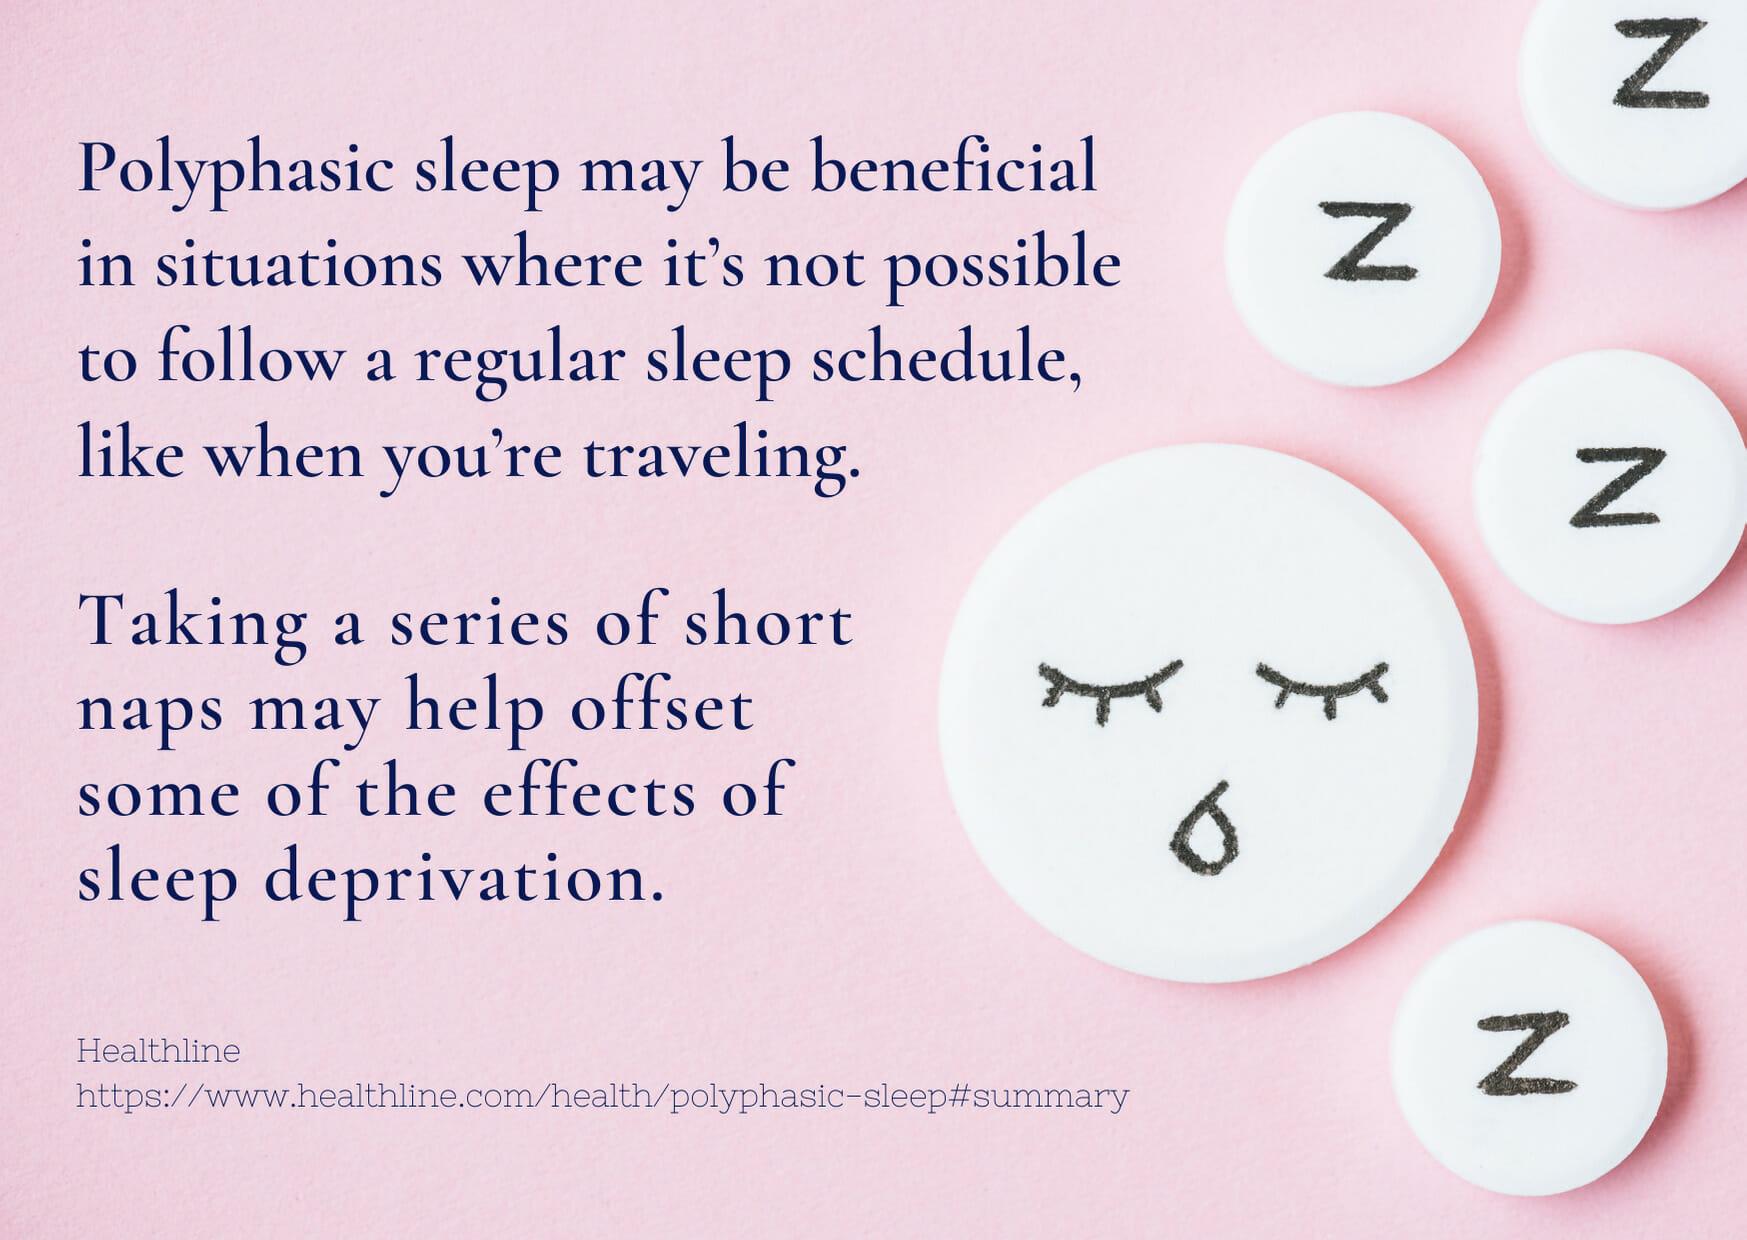 Polyphasic Sleep fact 3